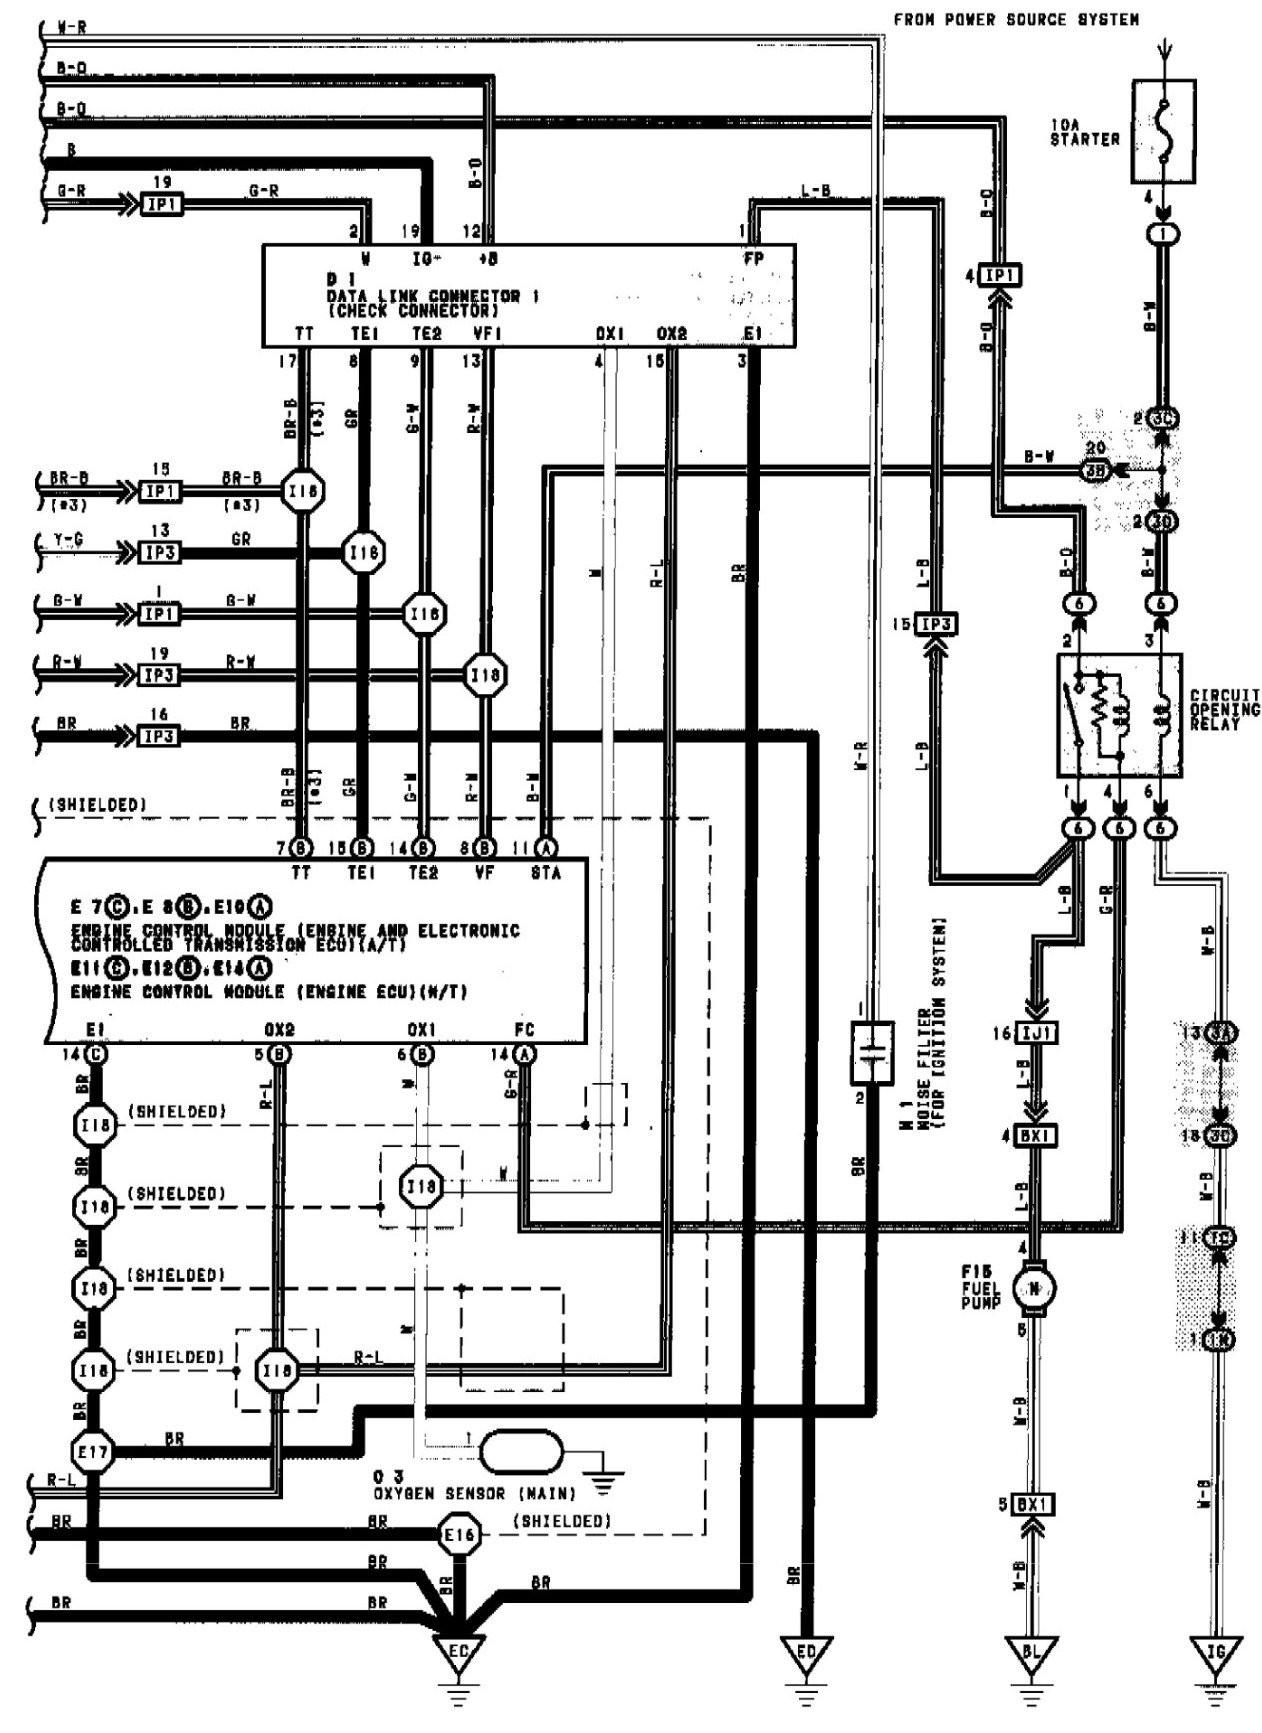 Toyotum Camry Wiring Diagram